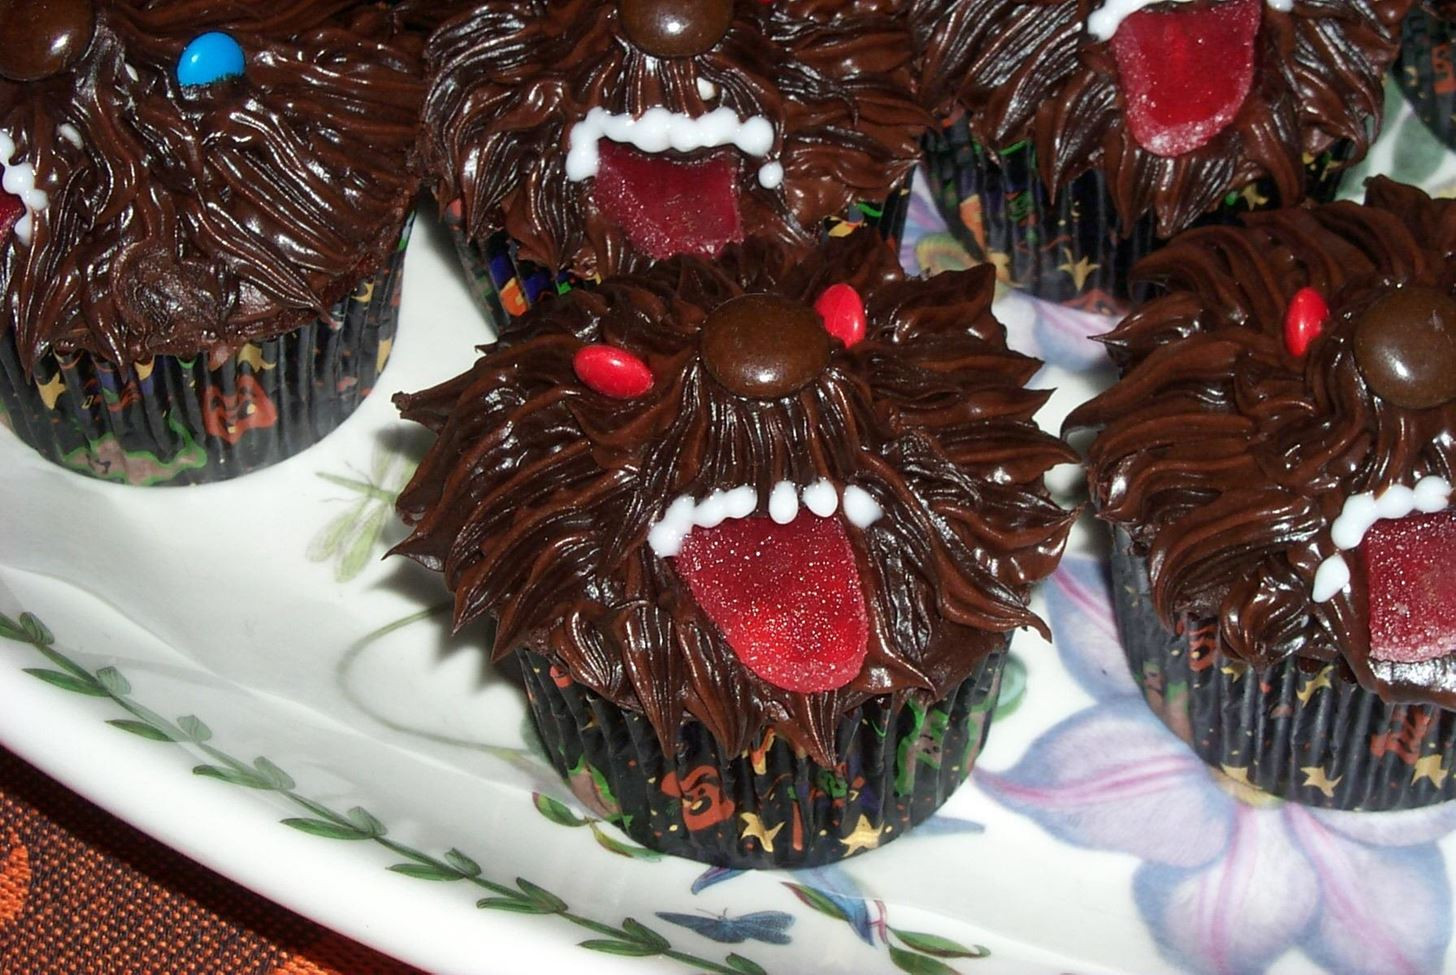 Creepy Halloween Desserts  Killer Cupcakes 6 Cute & Creepy Halloween Desserts Food